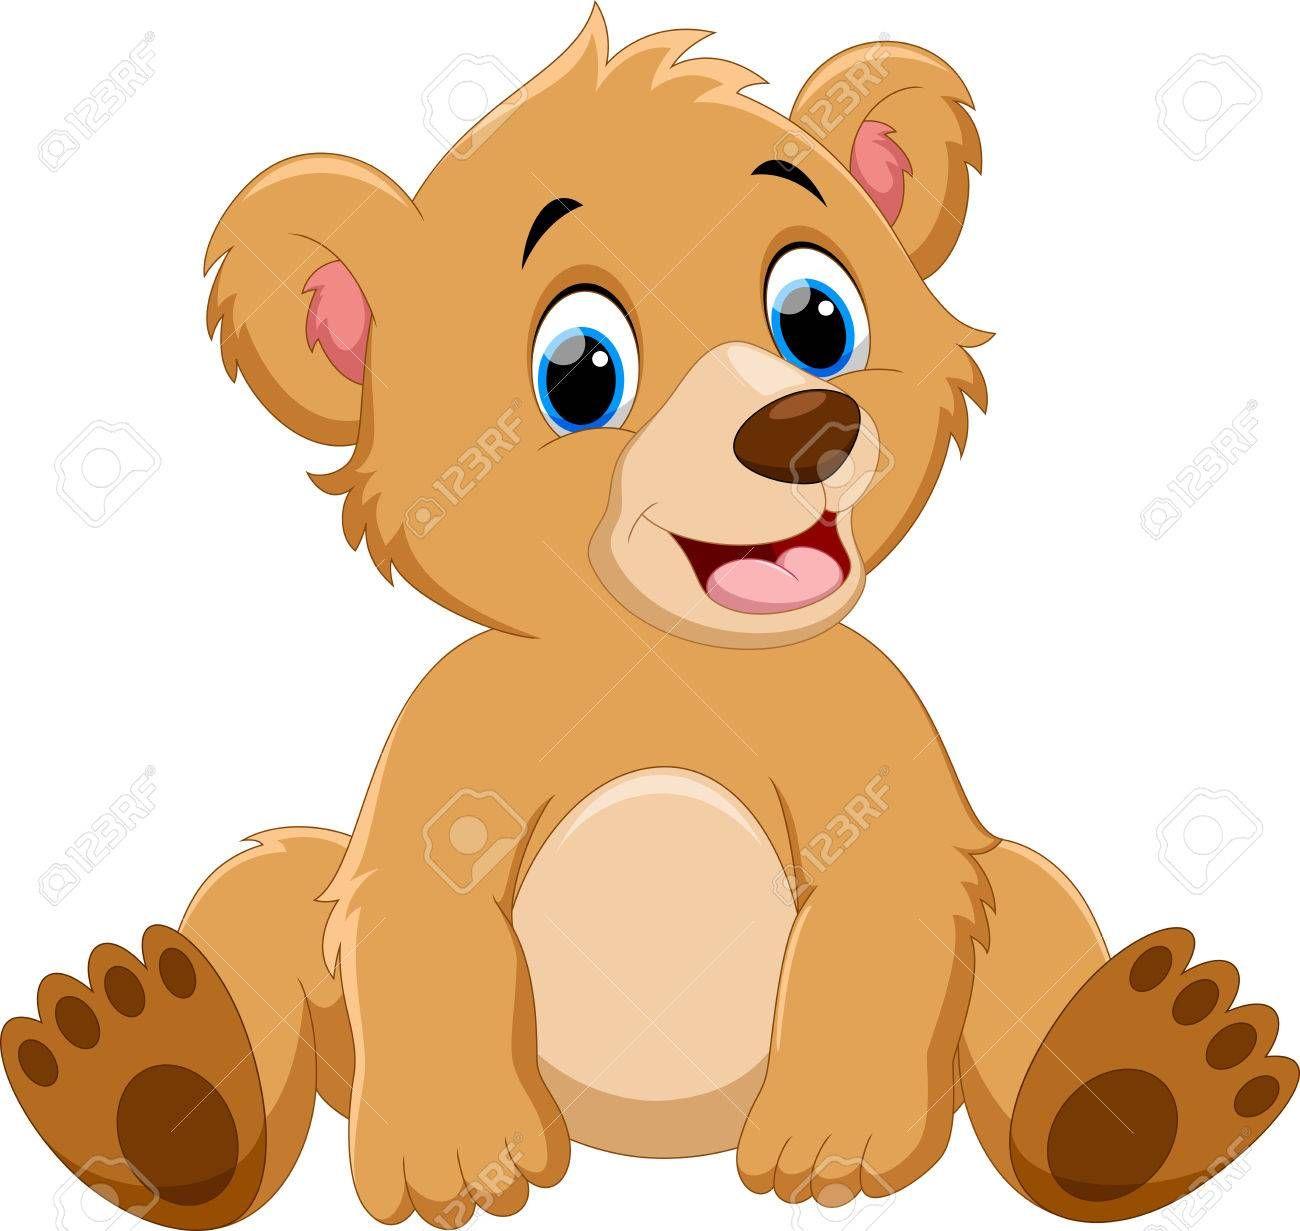 Cute Baby Bear Cartoon Sponsored Baby Cute Cartoon Bear Bear Cartoon Bear Cartoon Images Cartoon Animals